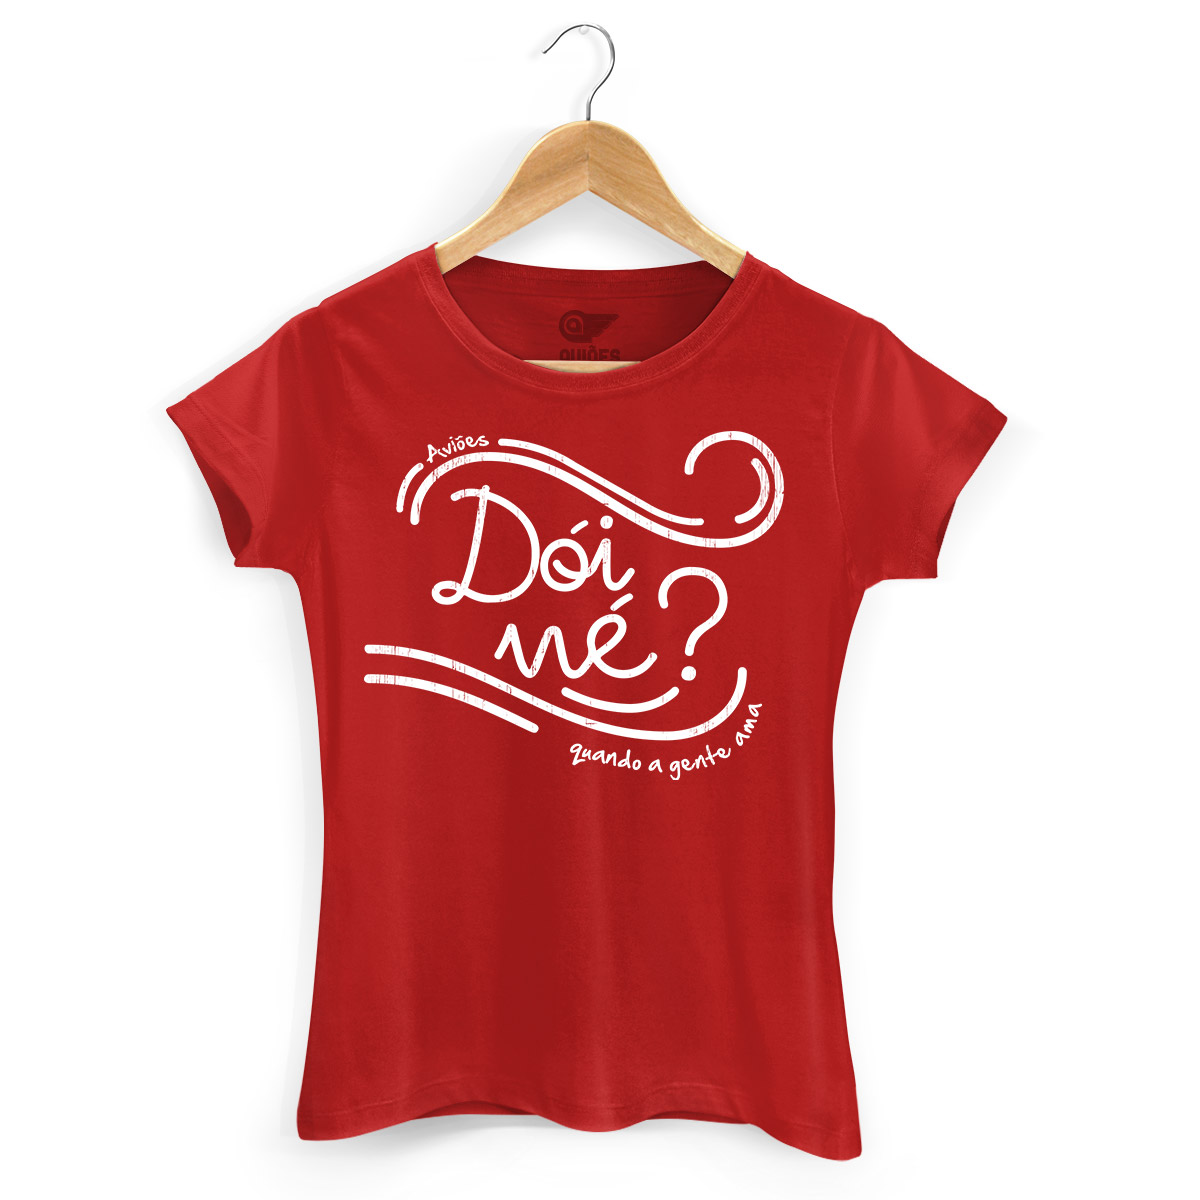 Camiseta Feminina Aviões do Forró Dói Ne?